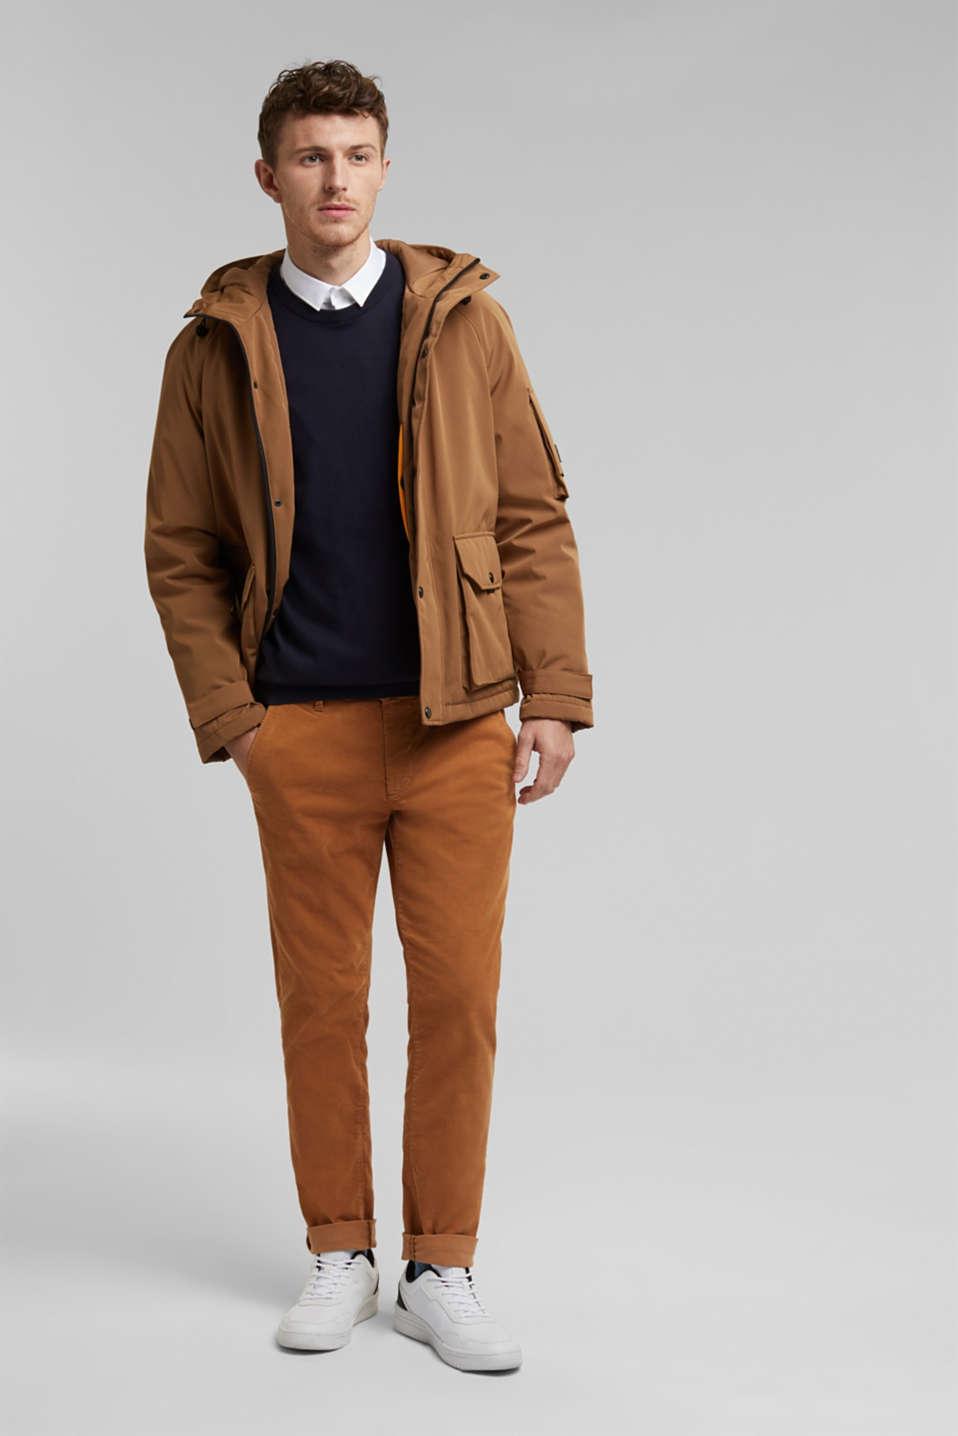 Jumper with a round neckline, 100% cotton, NAVY, detail image number 1